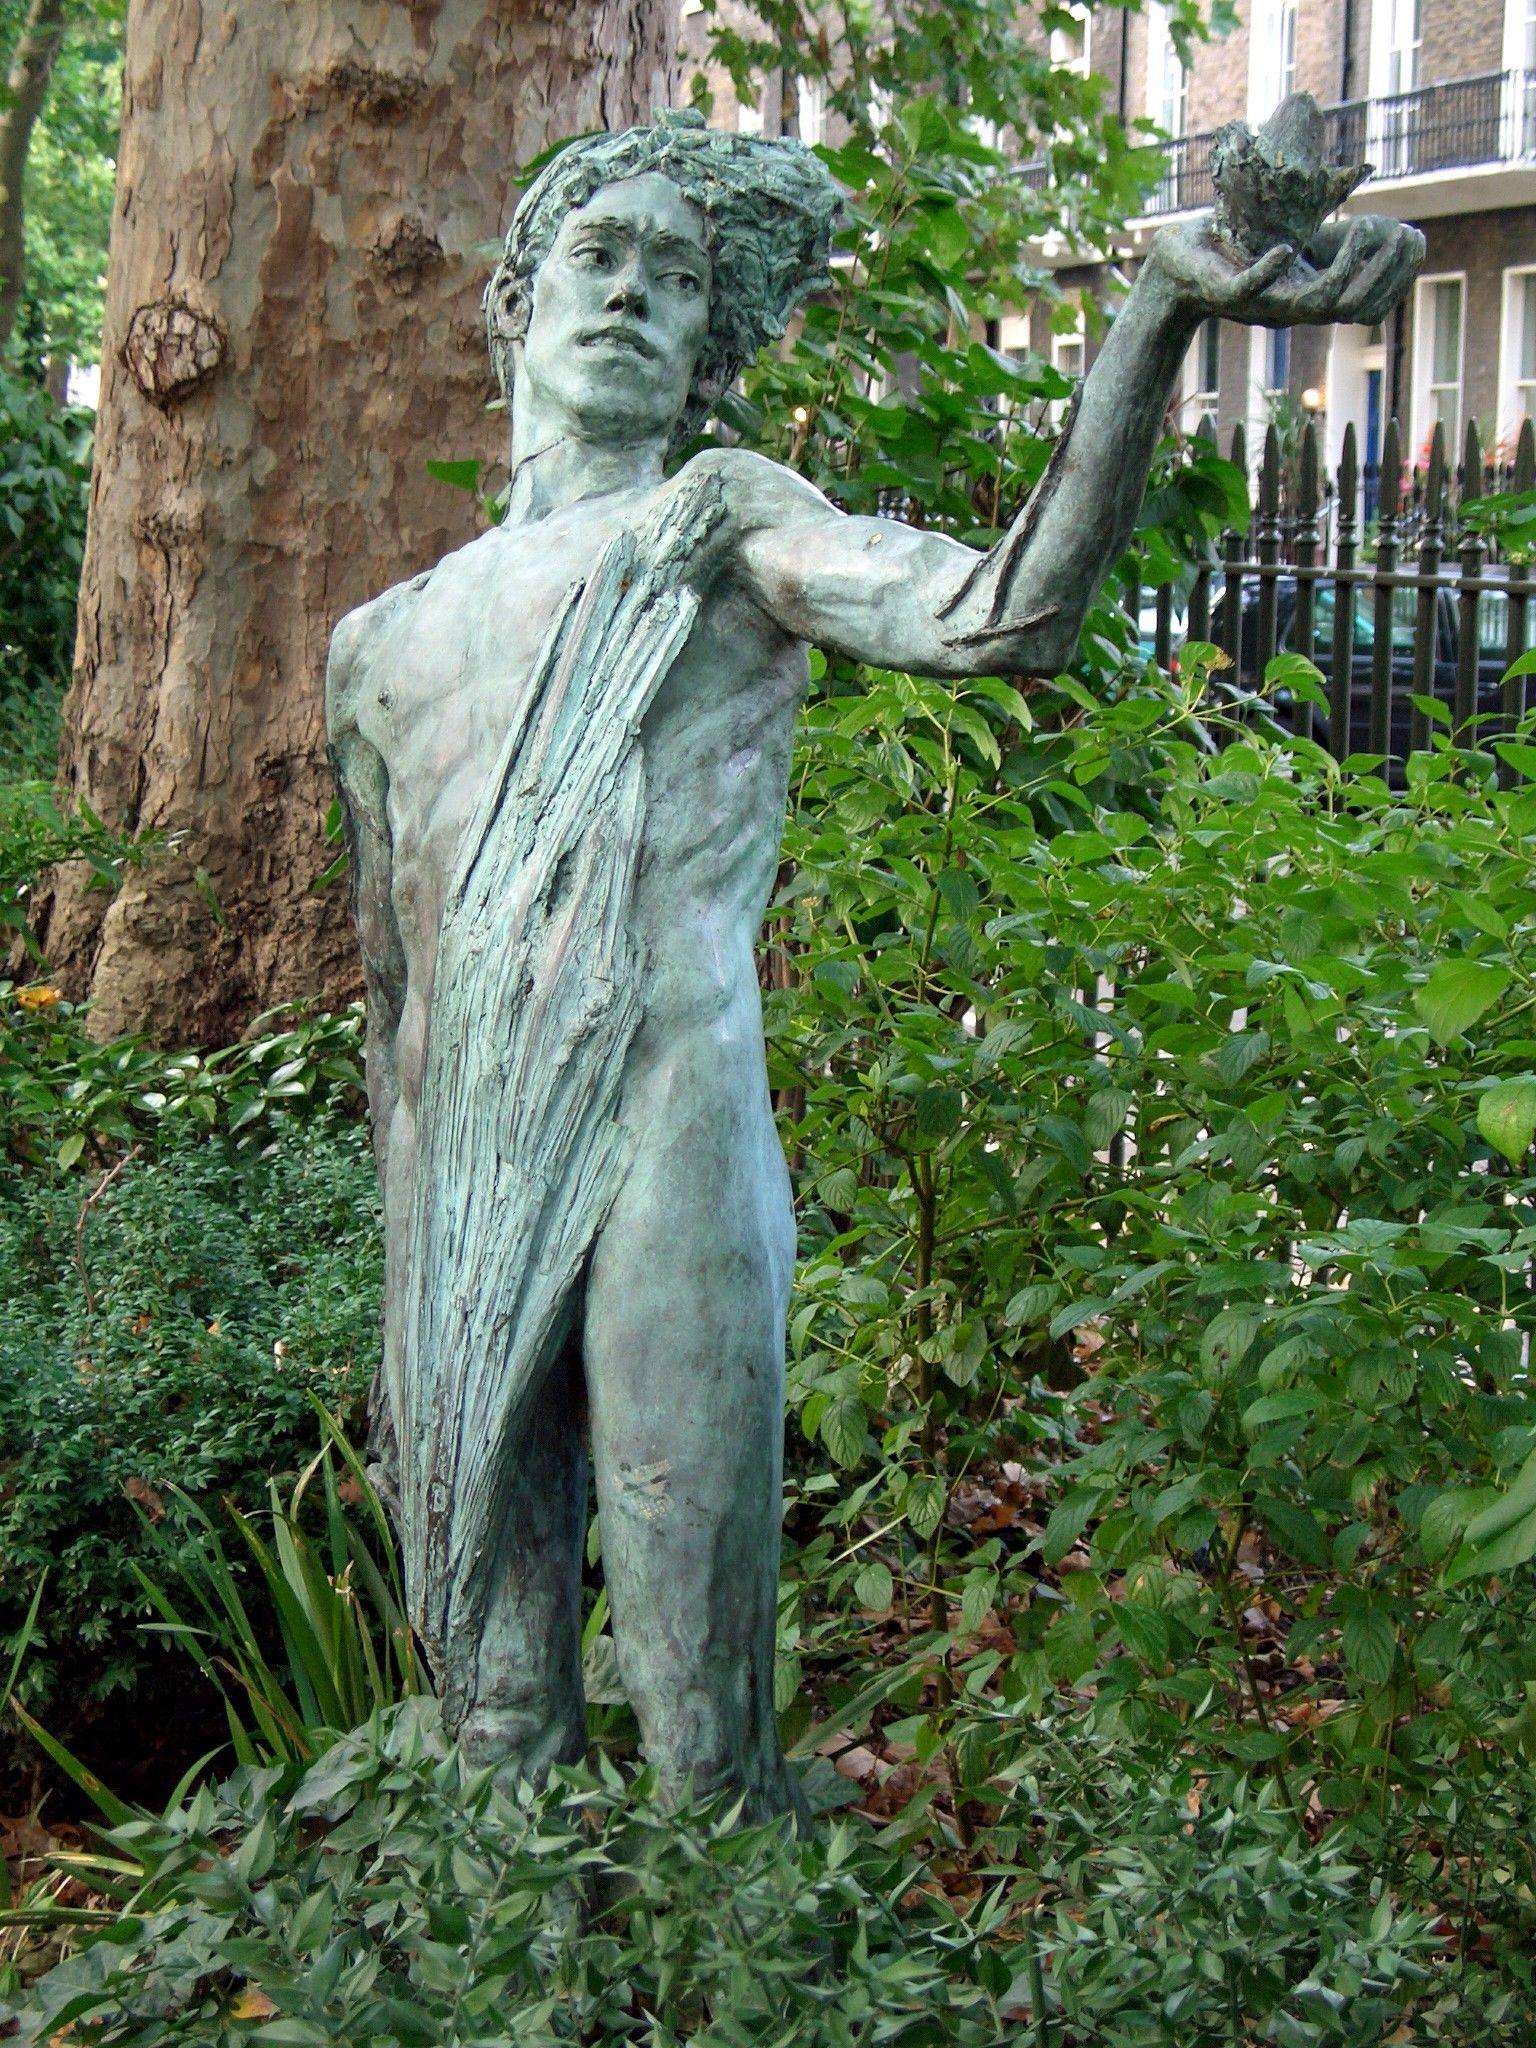 Delightful Description The Green Man By Lydia Kapinska, Woburn Square, London.JPG